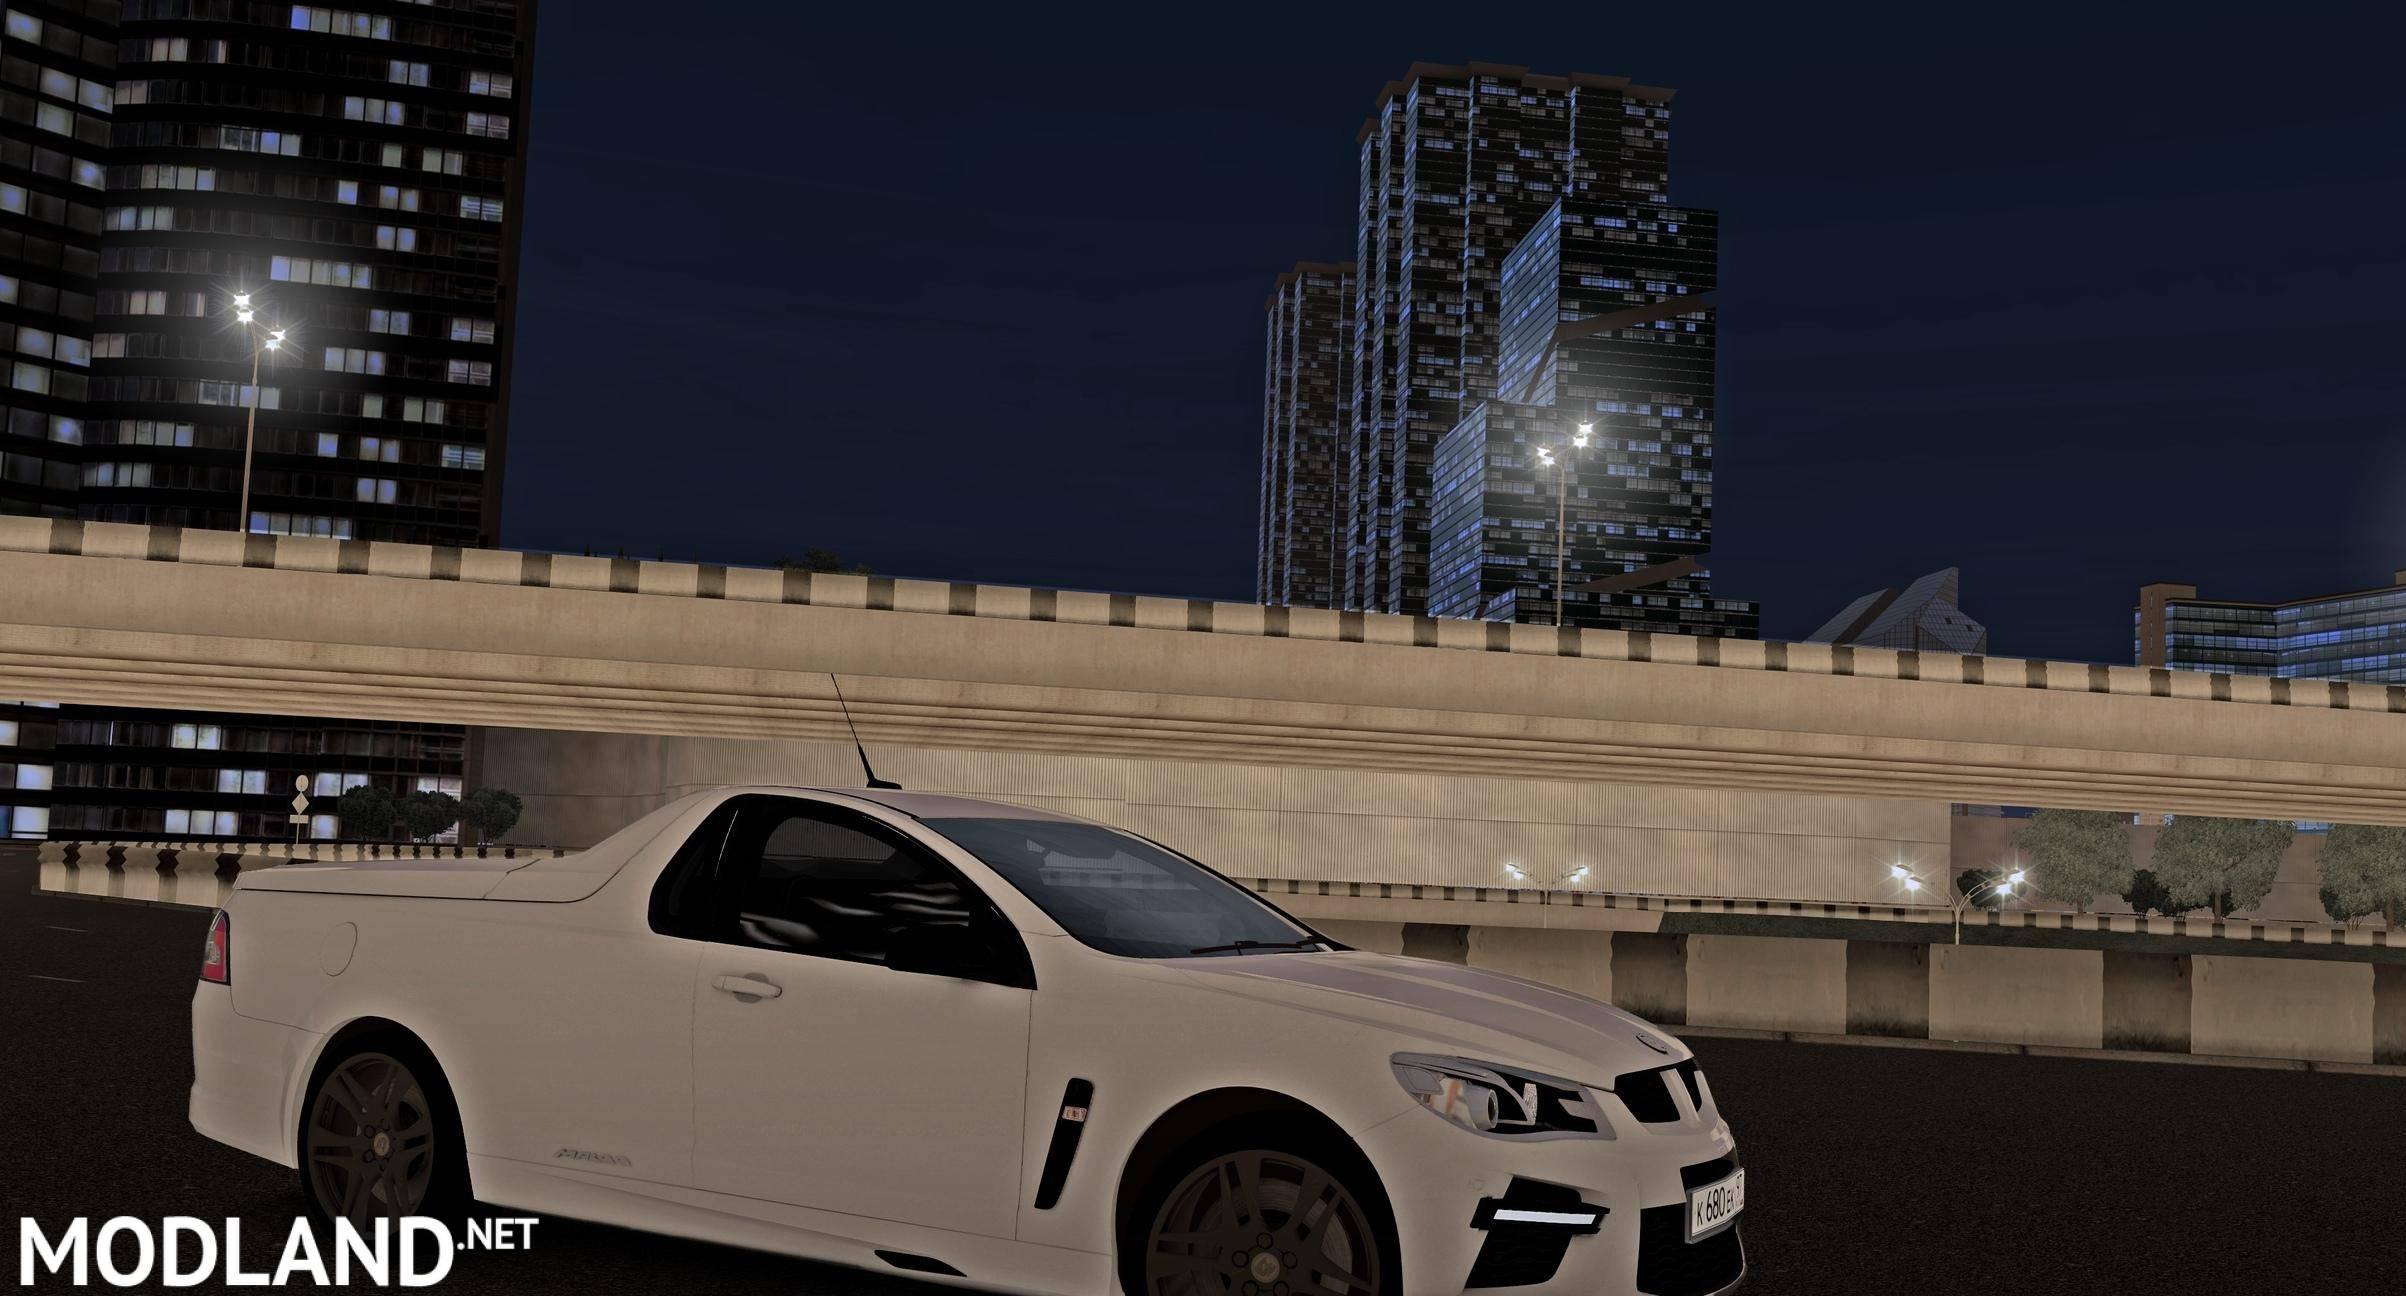 2014 HSV GTS Maloo mod City Car Driving